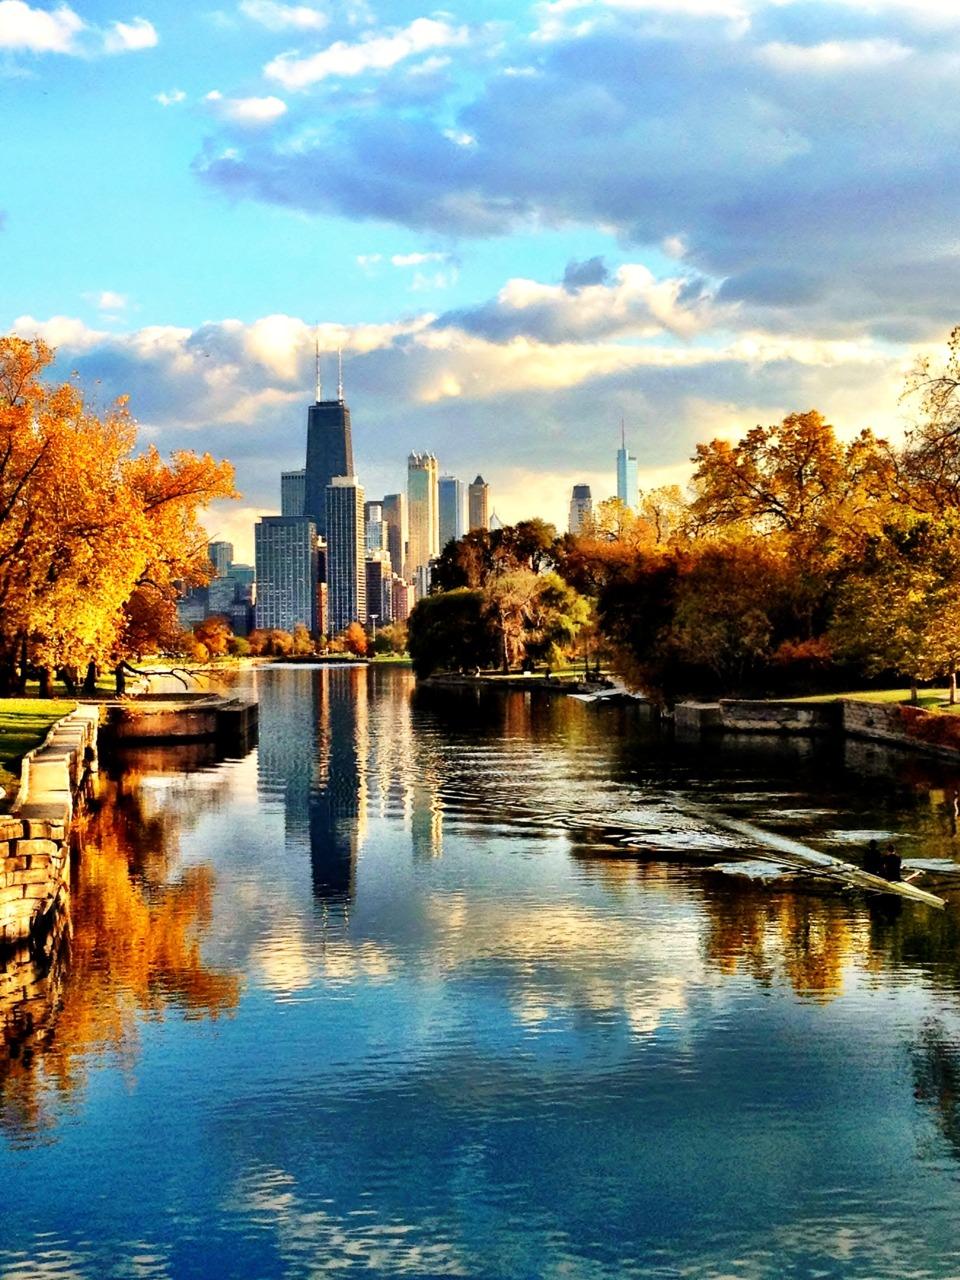 chicago-fall-waterway-zipitclunt- tumblr_lu5b9e9dYn1qjhhsgo1_1280.jpg